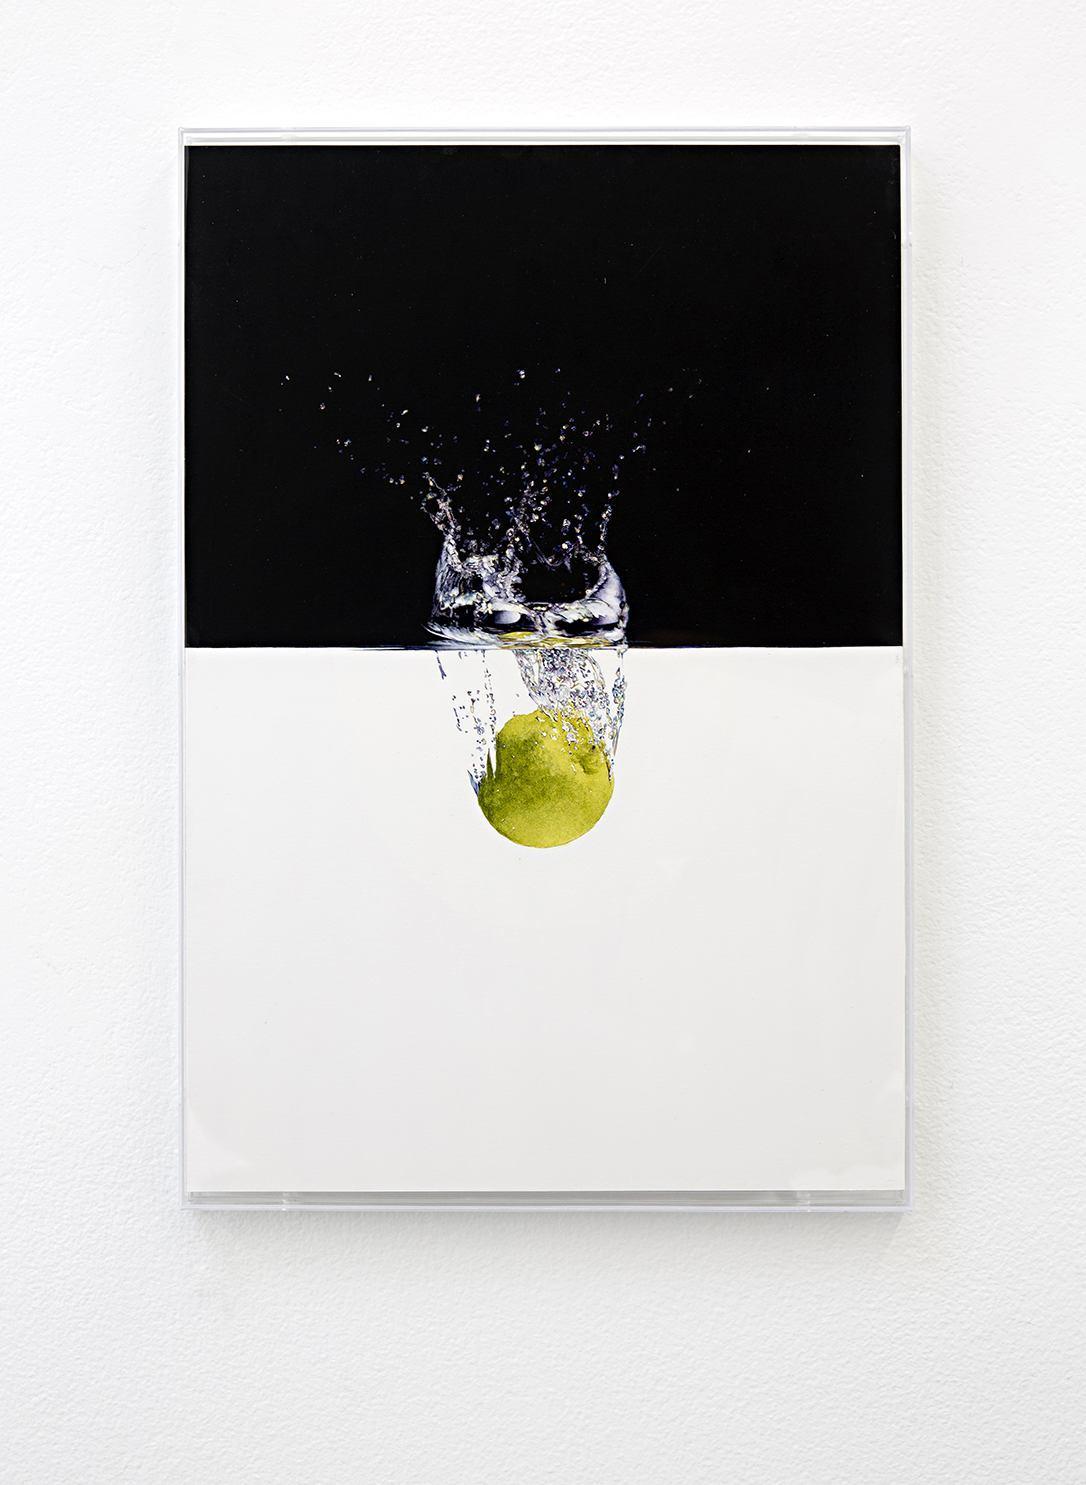 Untitled, watercolor on paper - Jackson Slattery